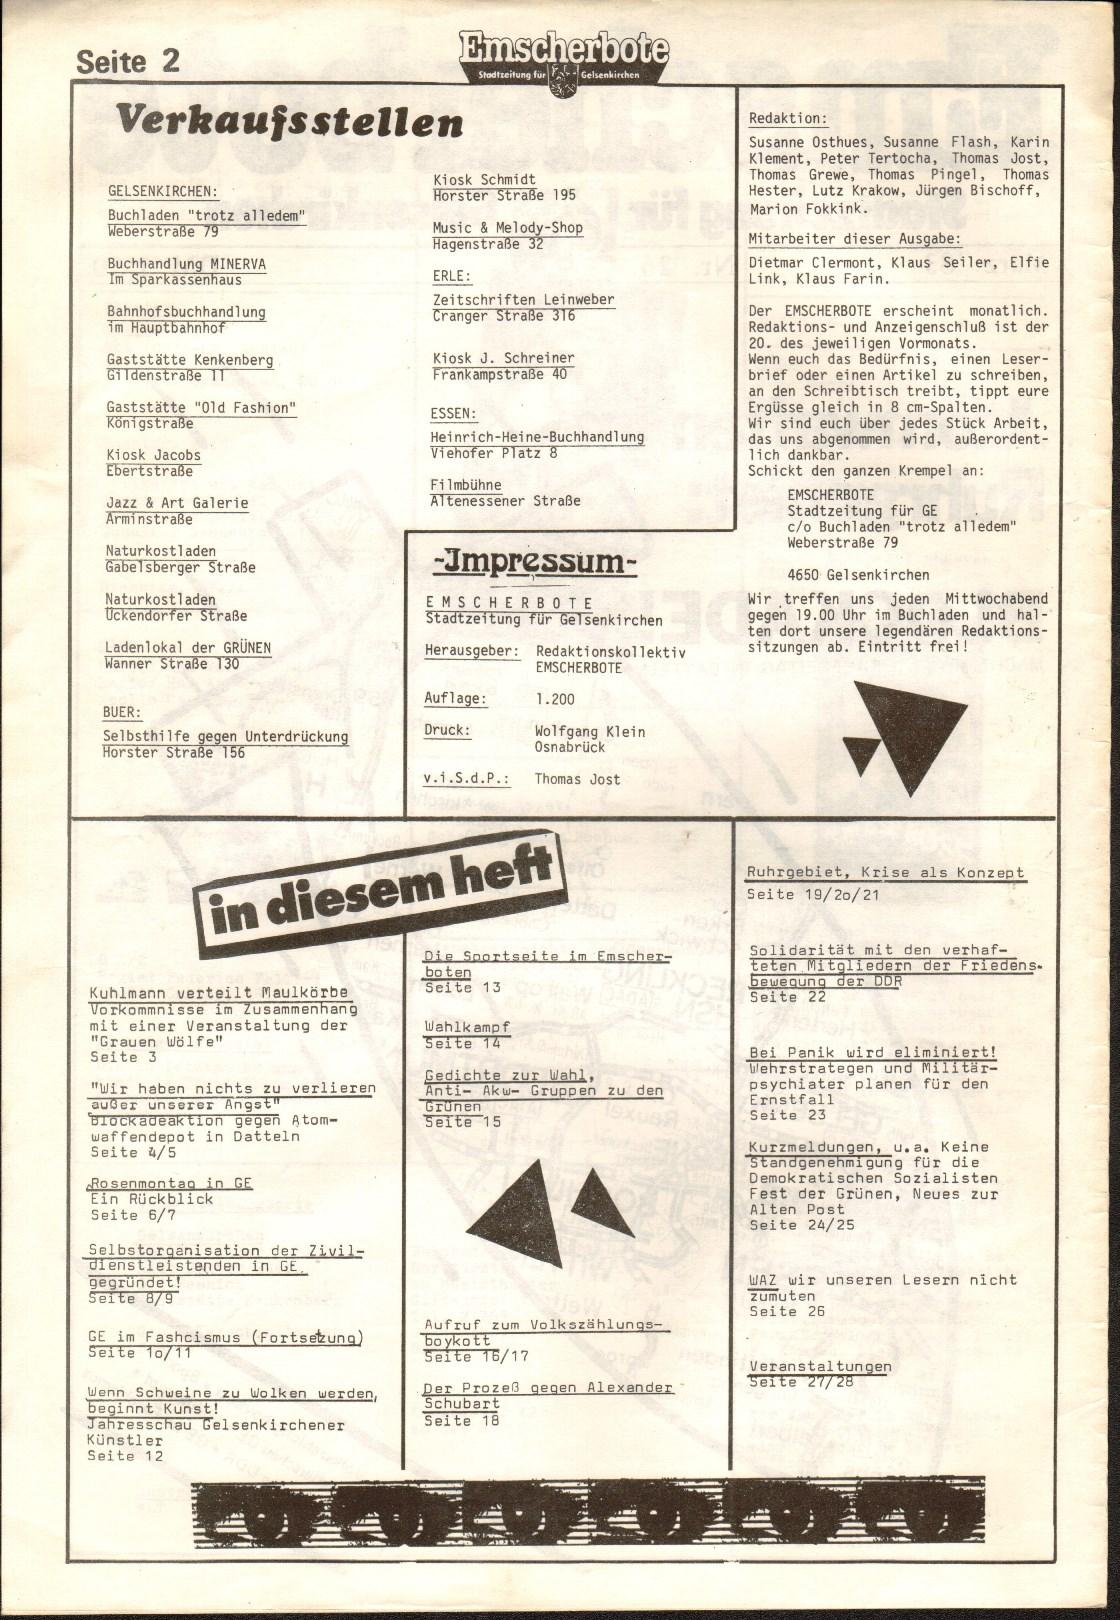 Gelsenkirchen_Emscherbote_1983_26_02